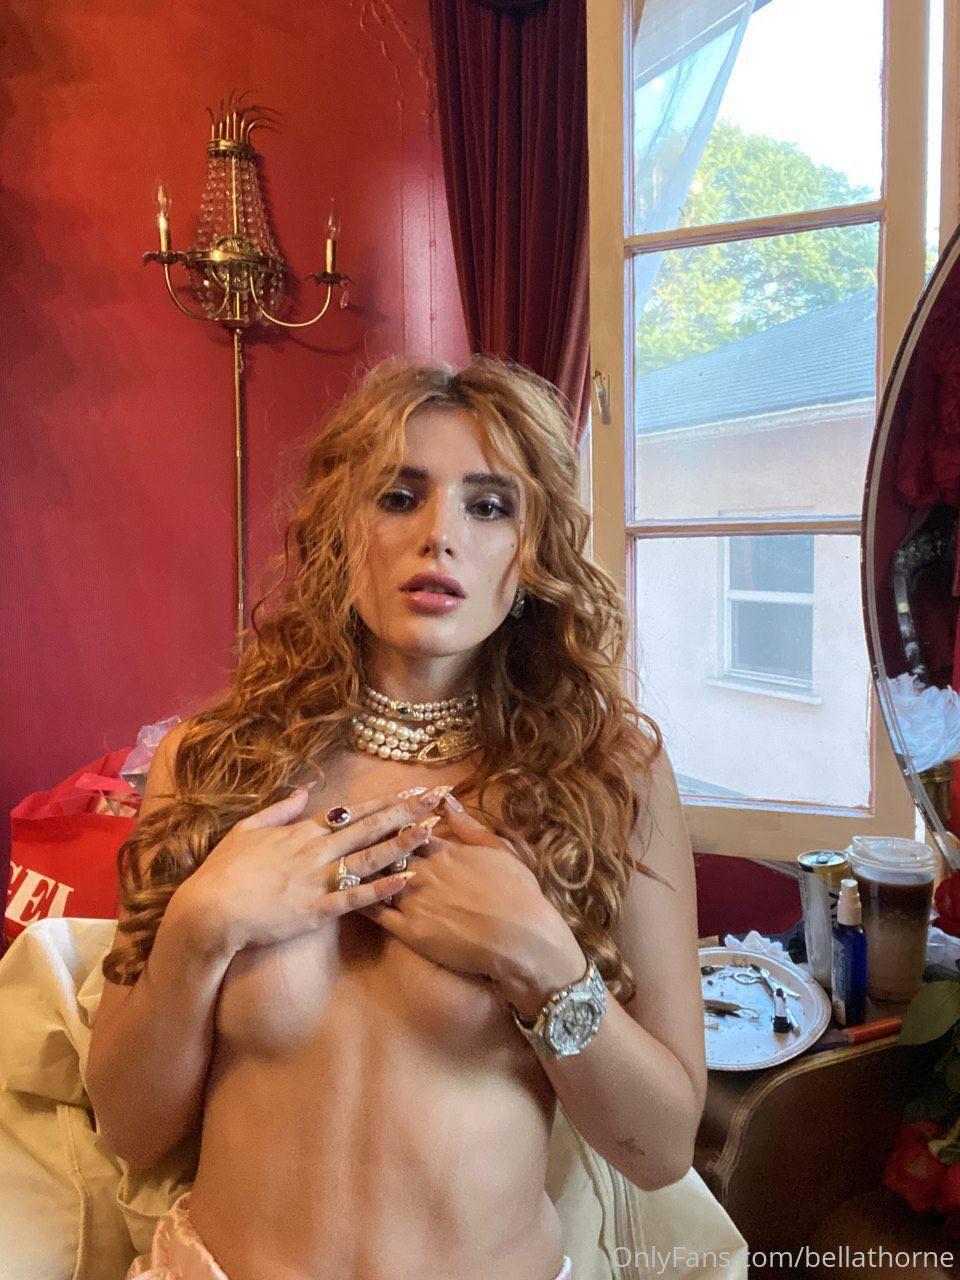 Bella Thorne Topless Hand Bra